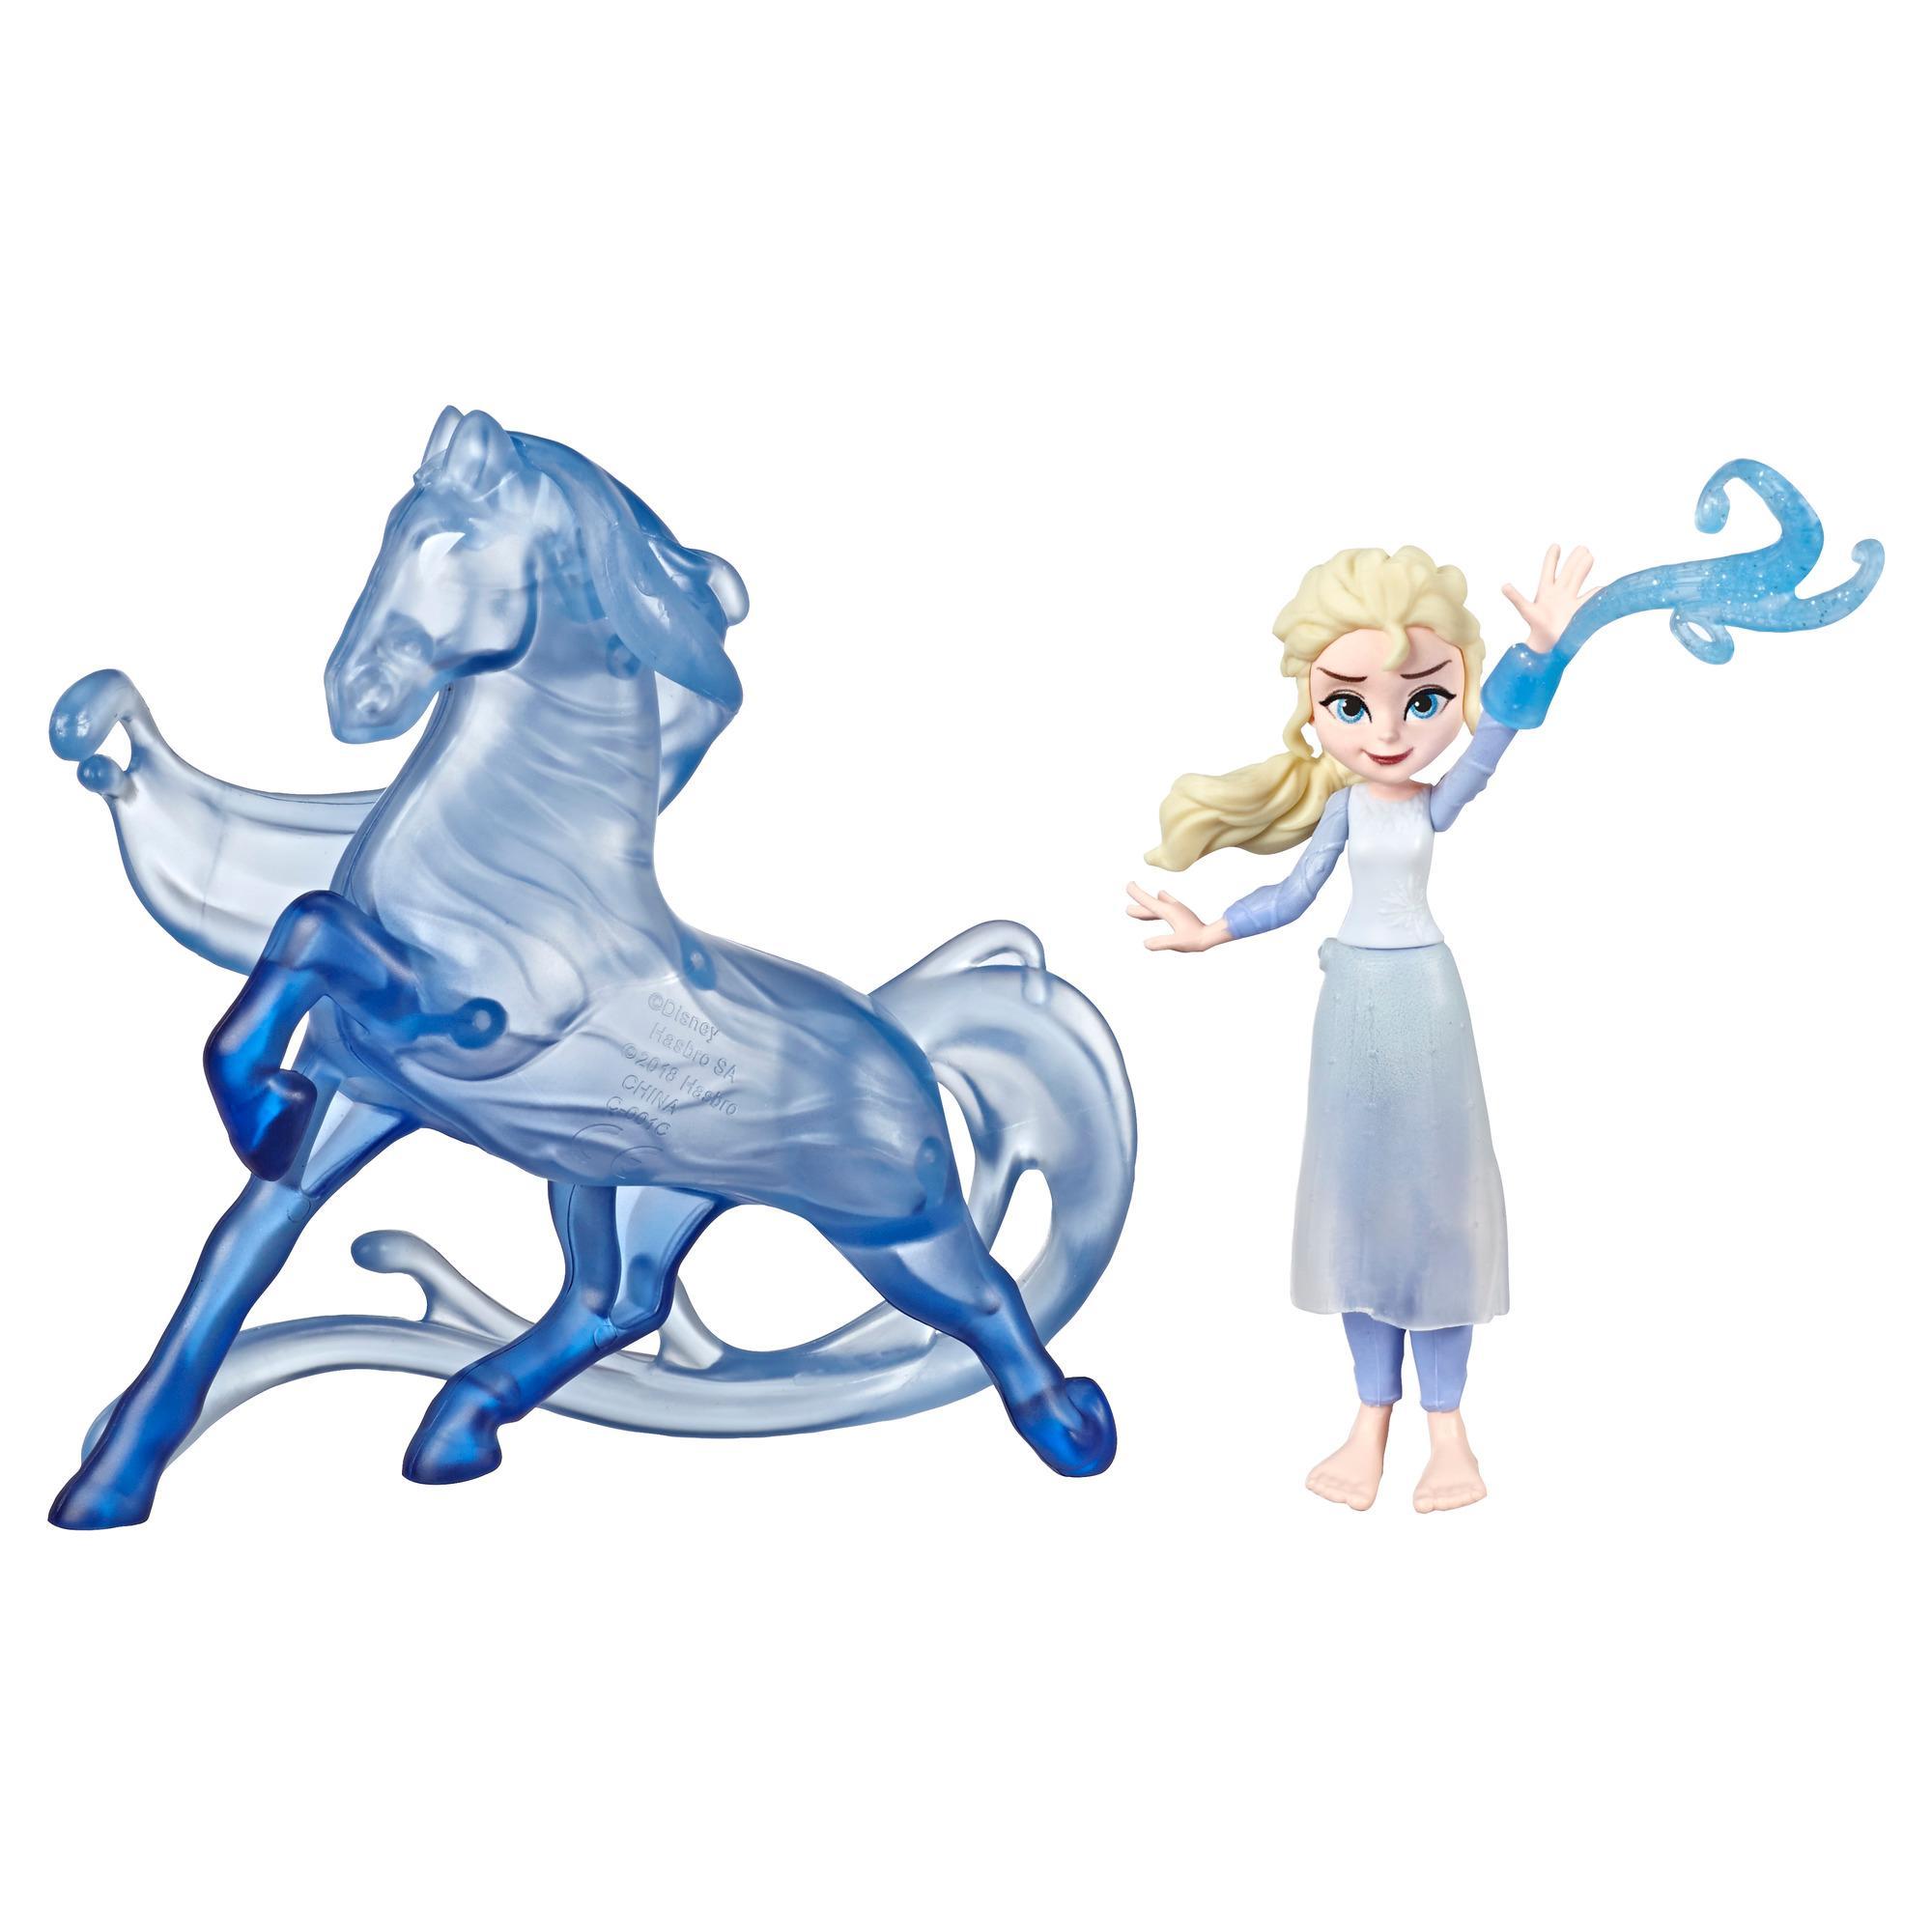 Disney Frozen Elsa Small Doll and the Nokk Figure Inspired by Disney Frozen 2